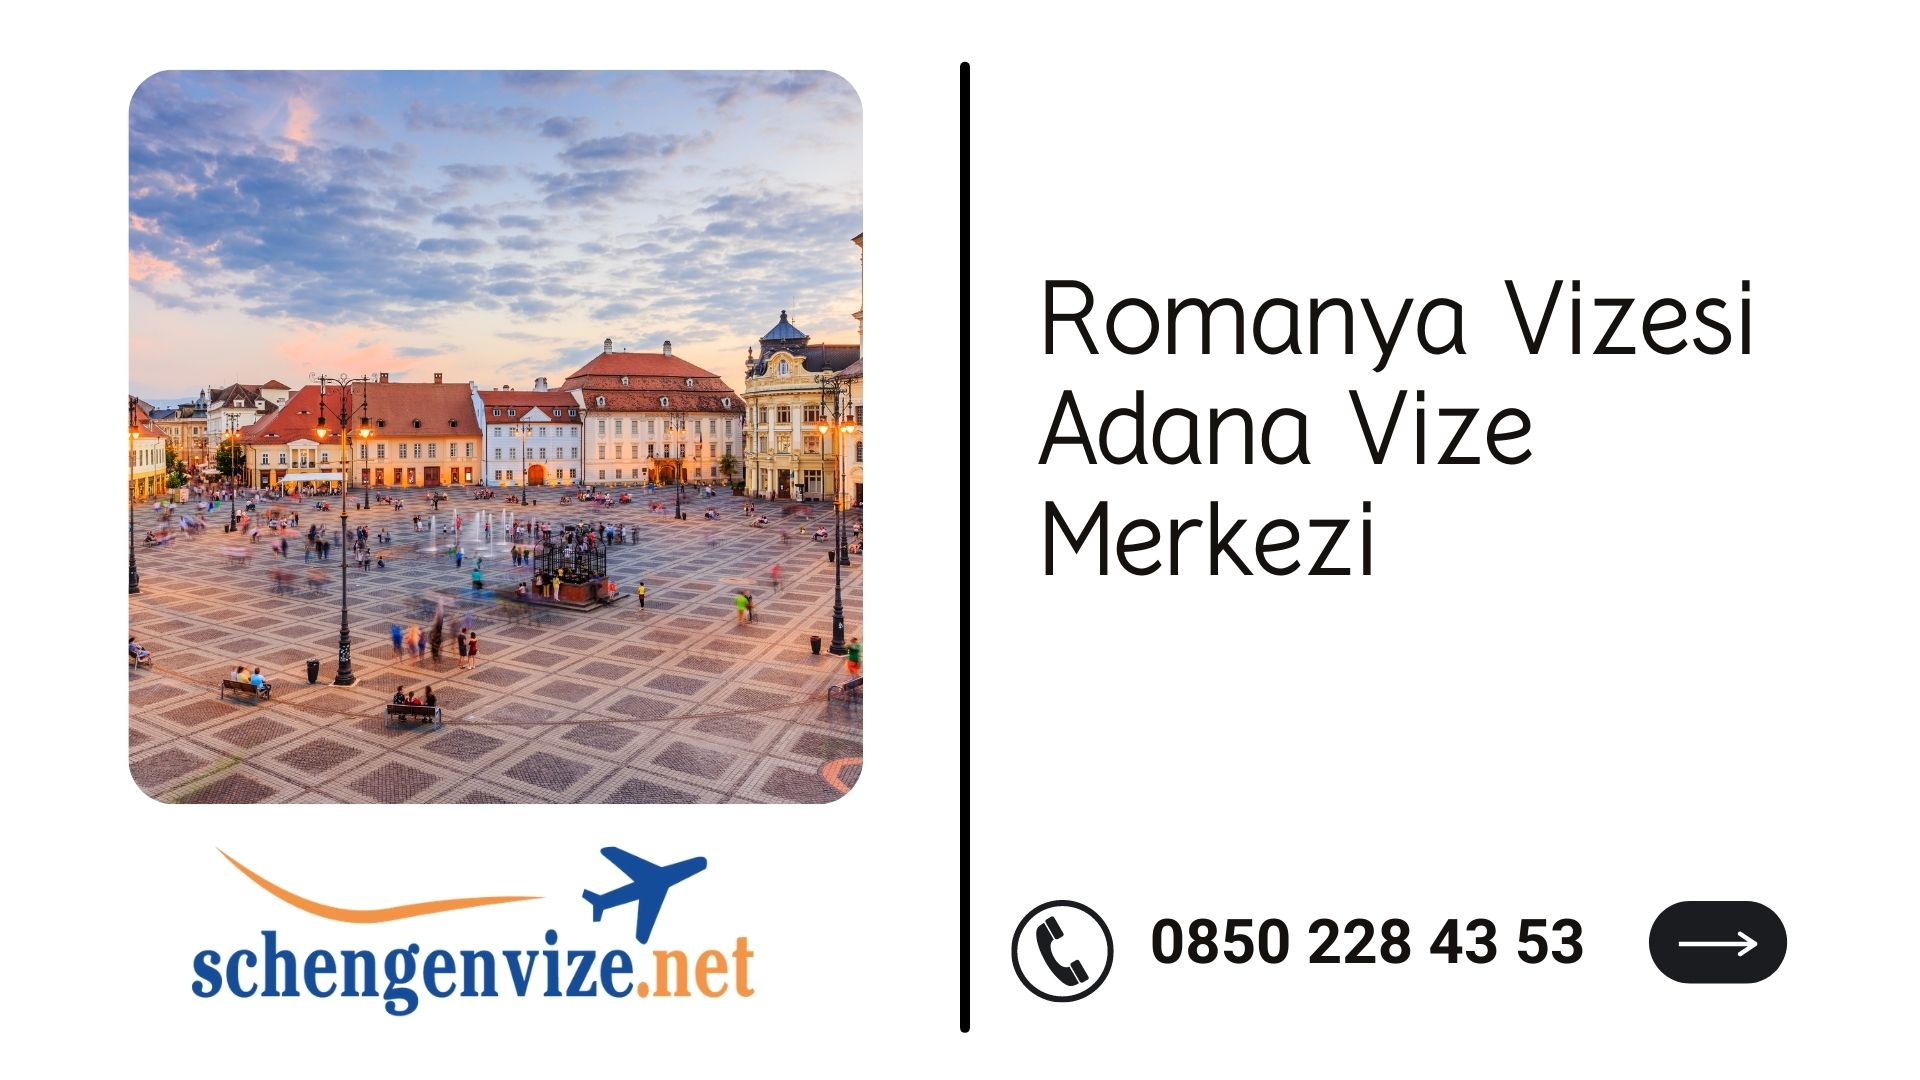 Romanya Vizesi Adana Vize Merkezi